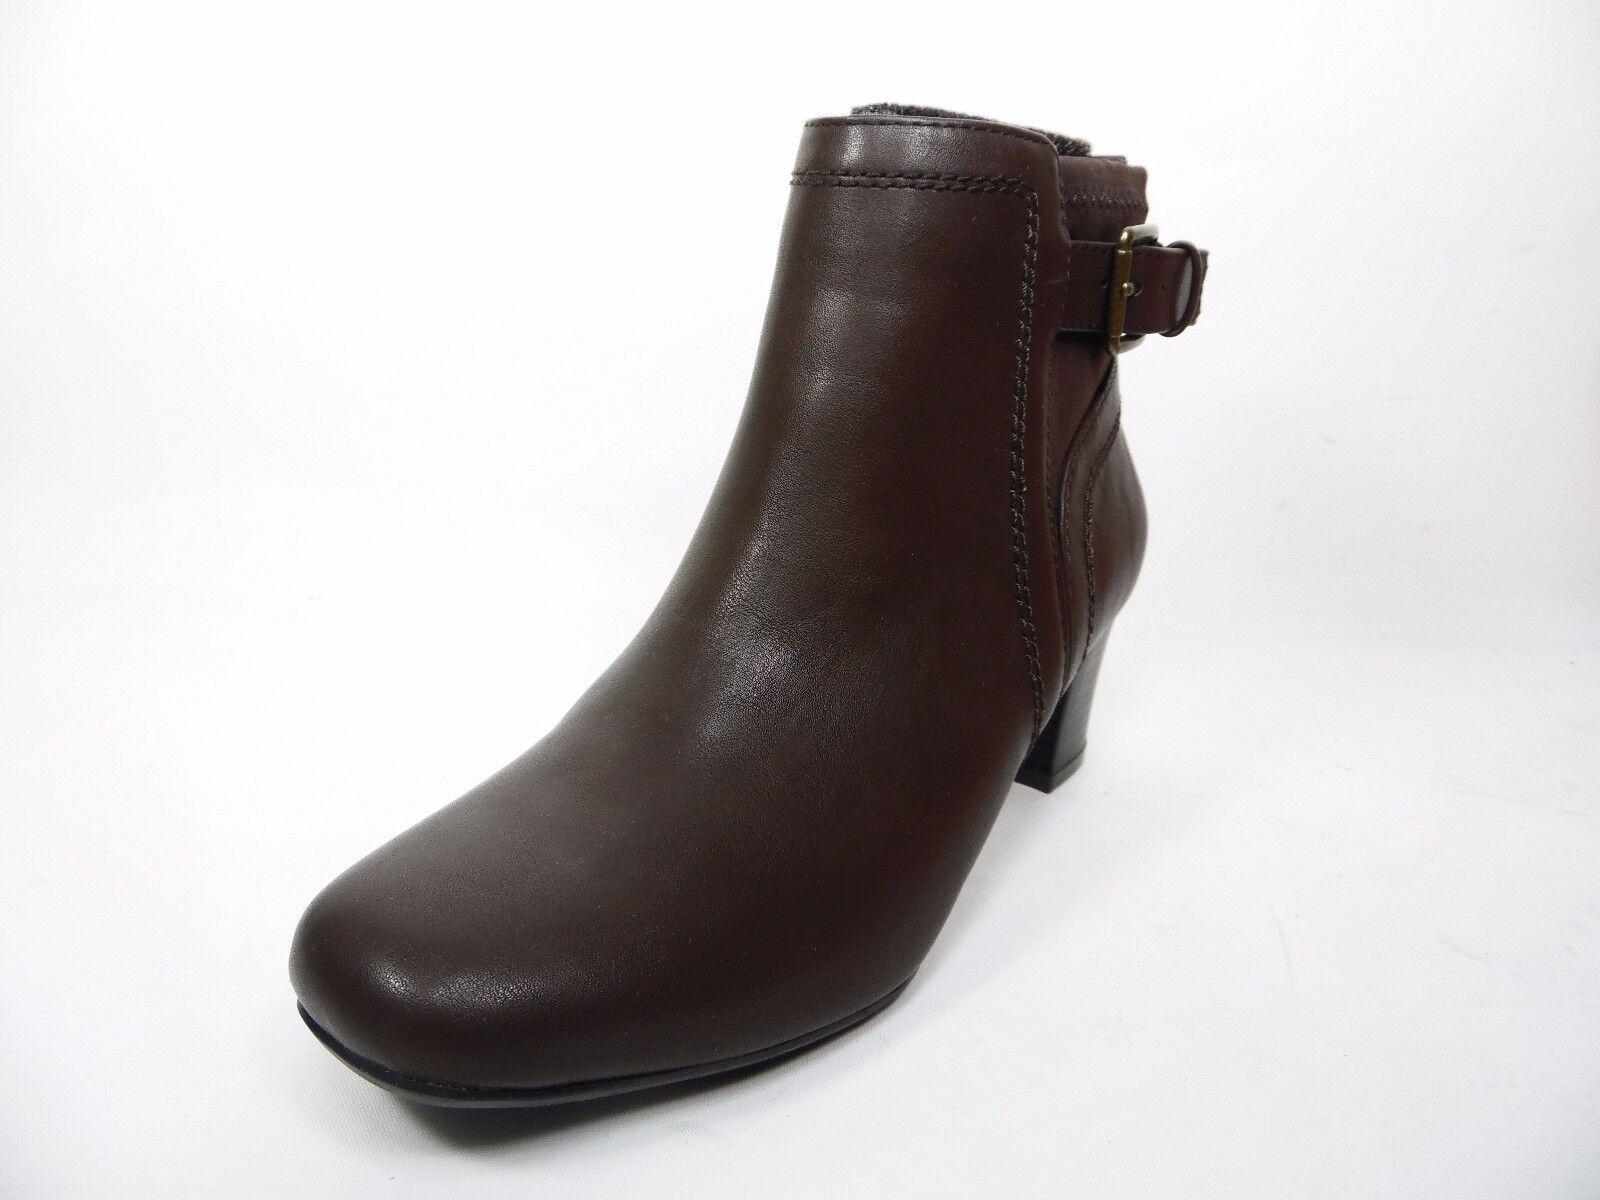 East 5th  Rico Heeled Ankle Stiefel braun Größe 6M